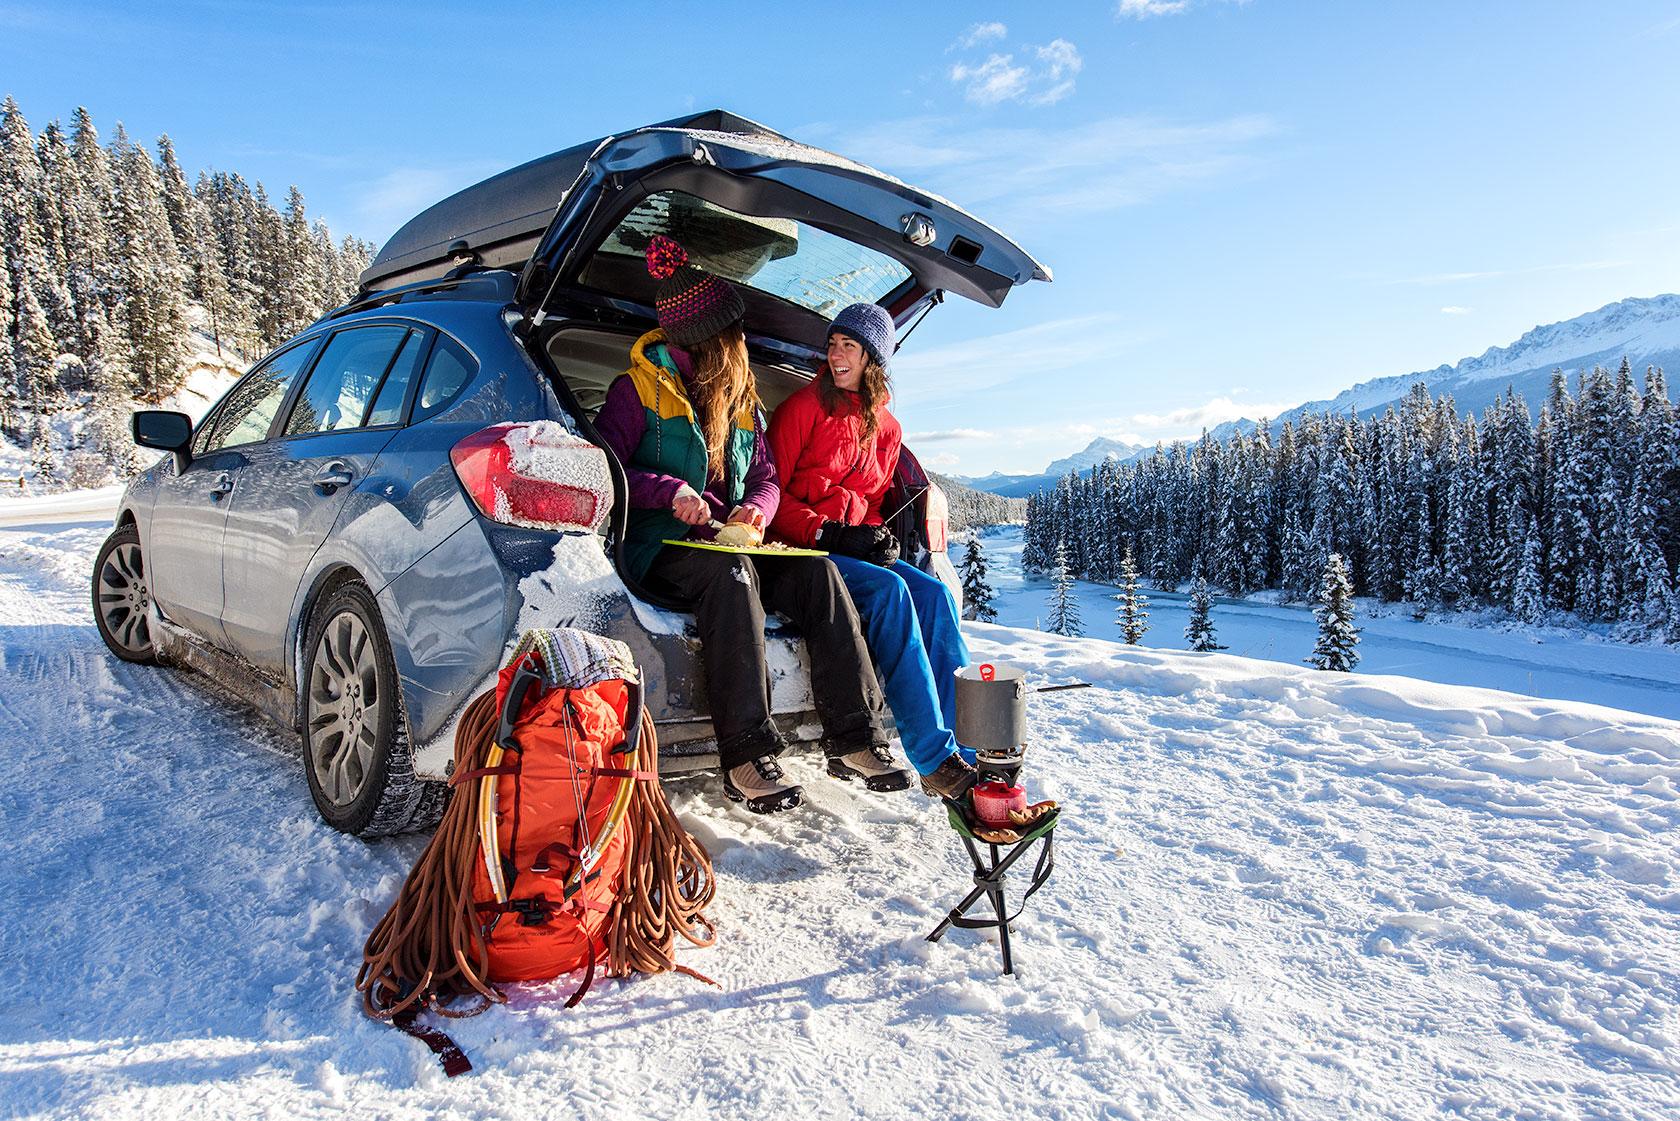 austin-trigg-patagonia-banff-alberta-winter-canada-trip-adventure-outside-snow-forest-fondue-roadside-car-cooking-lifestyle.jpg